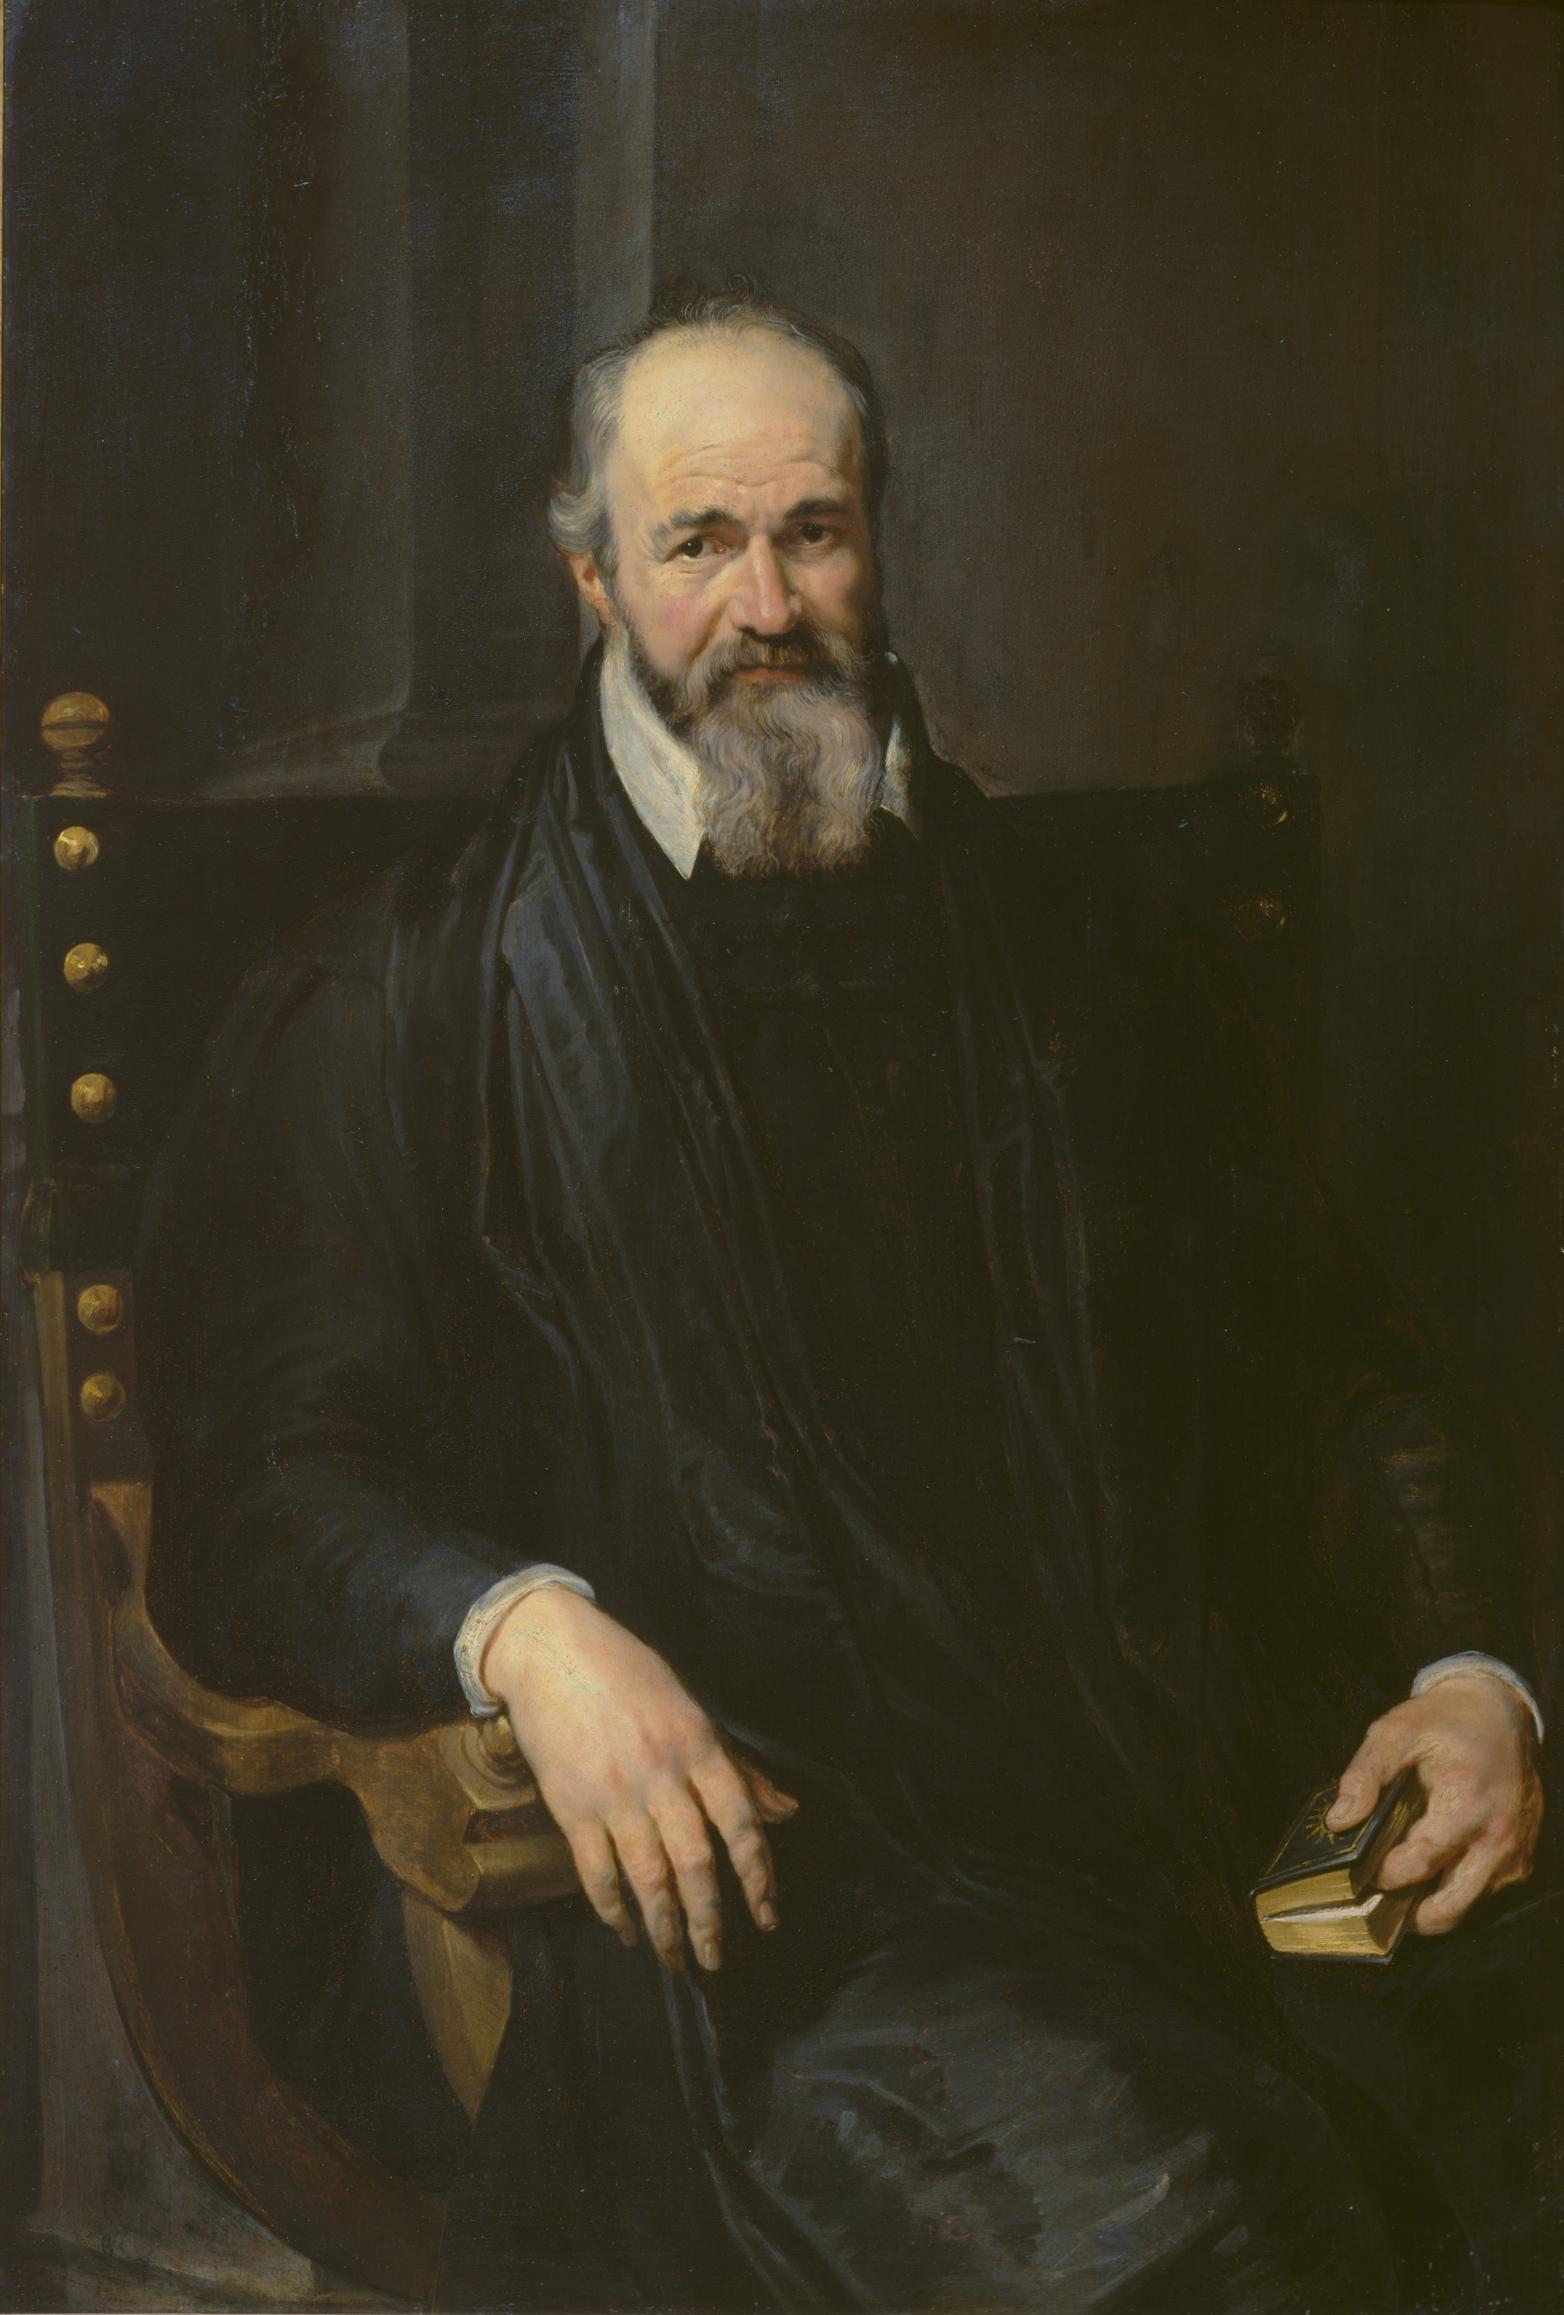 Portrait of a Man in an Armchair